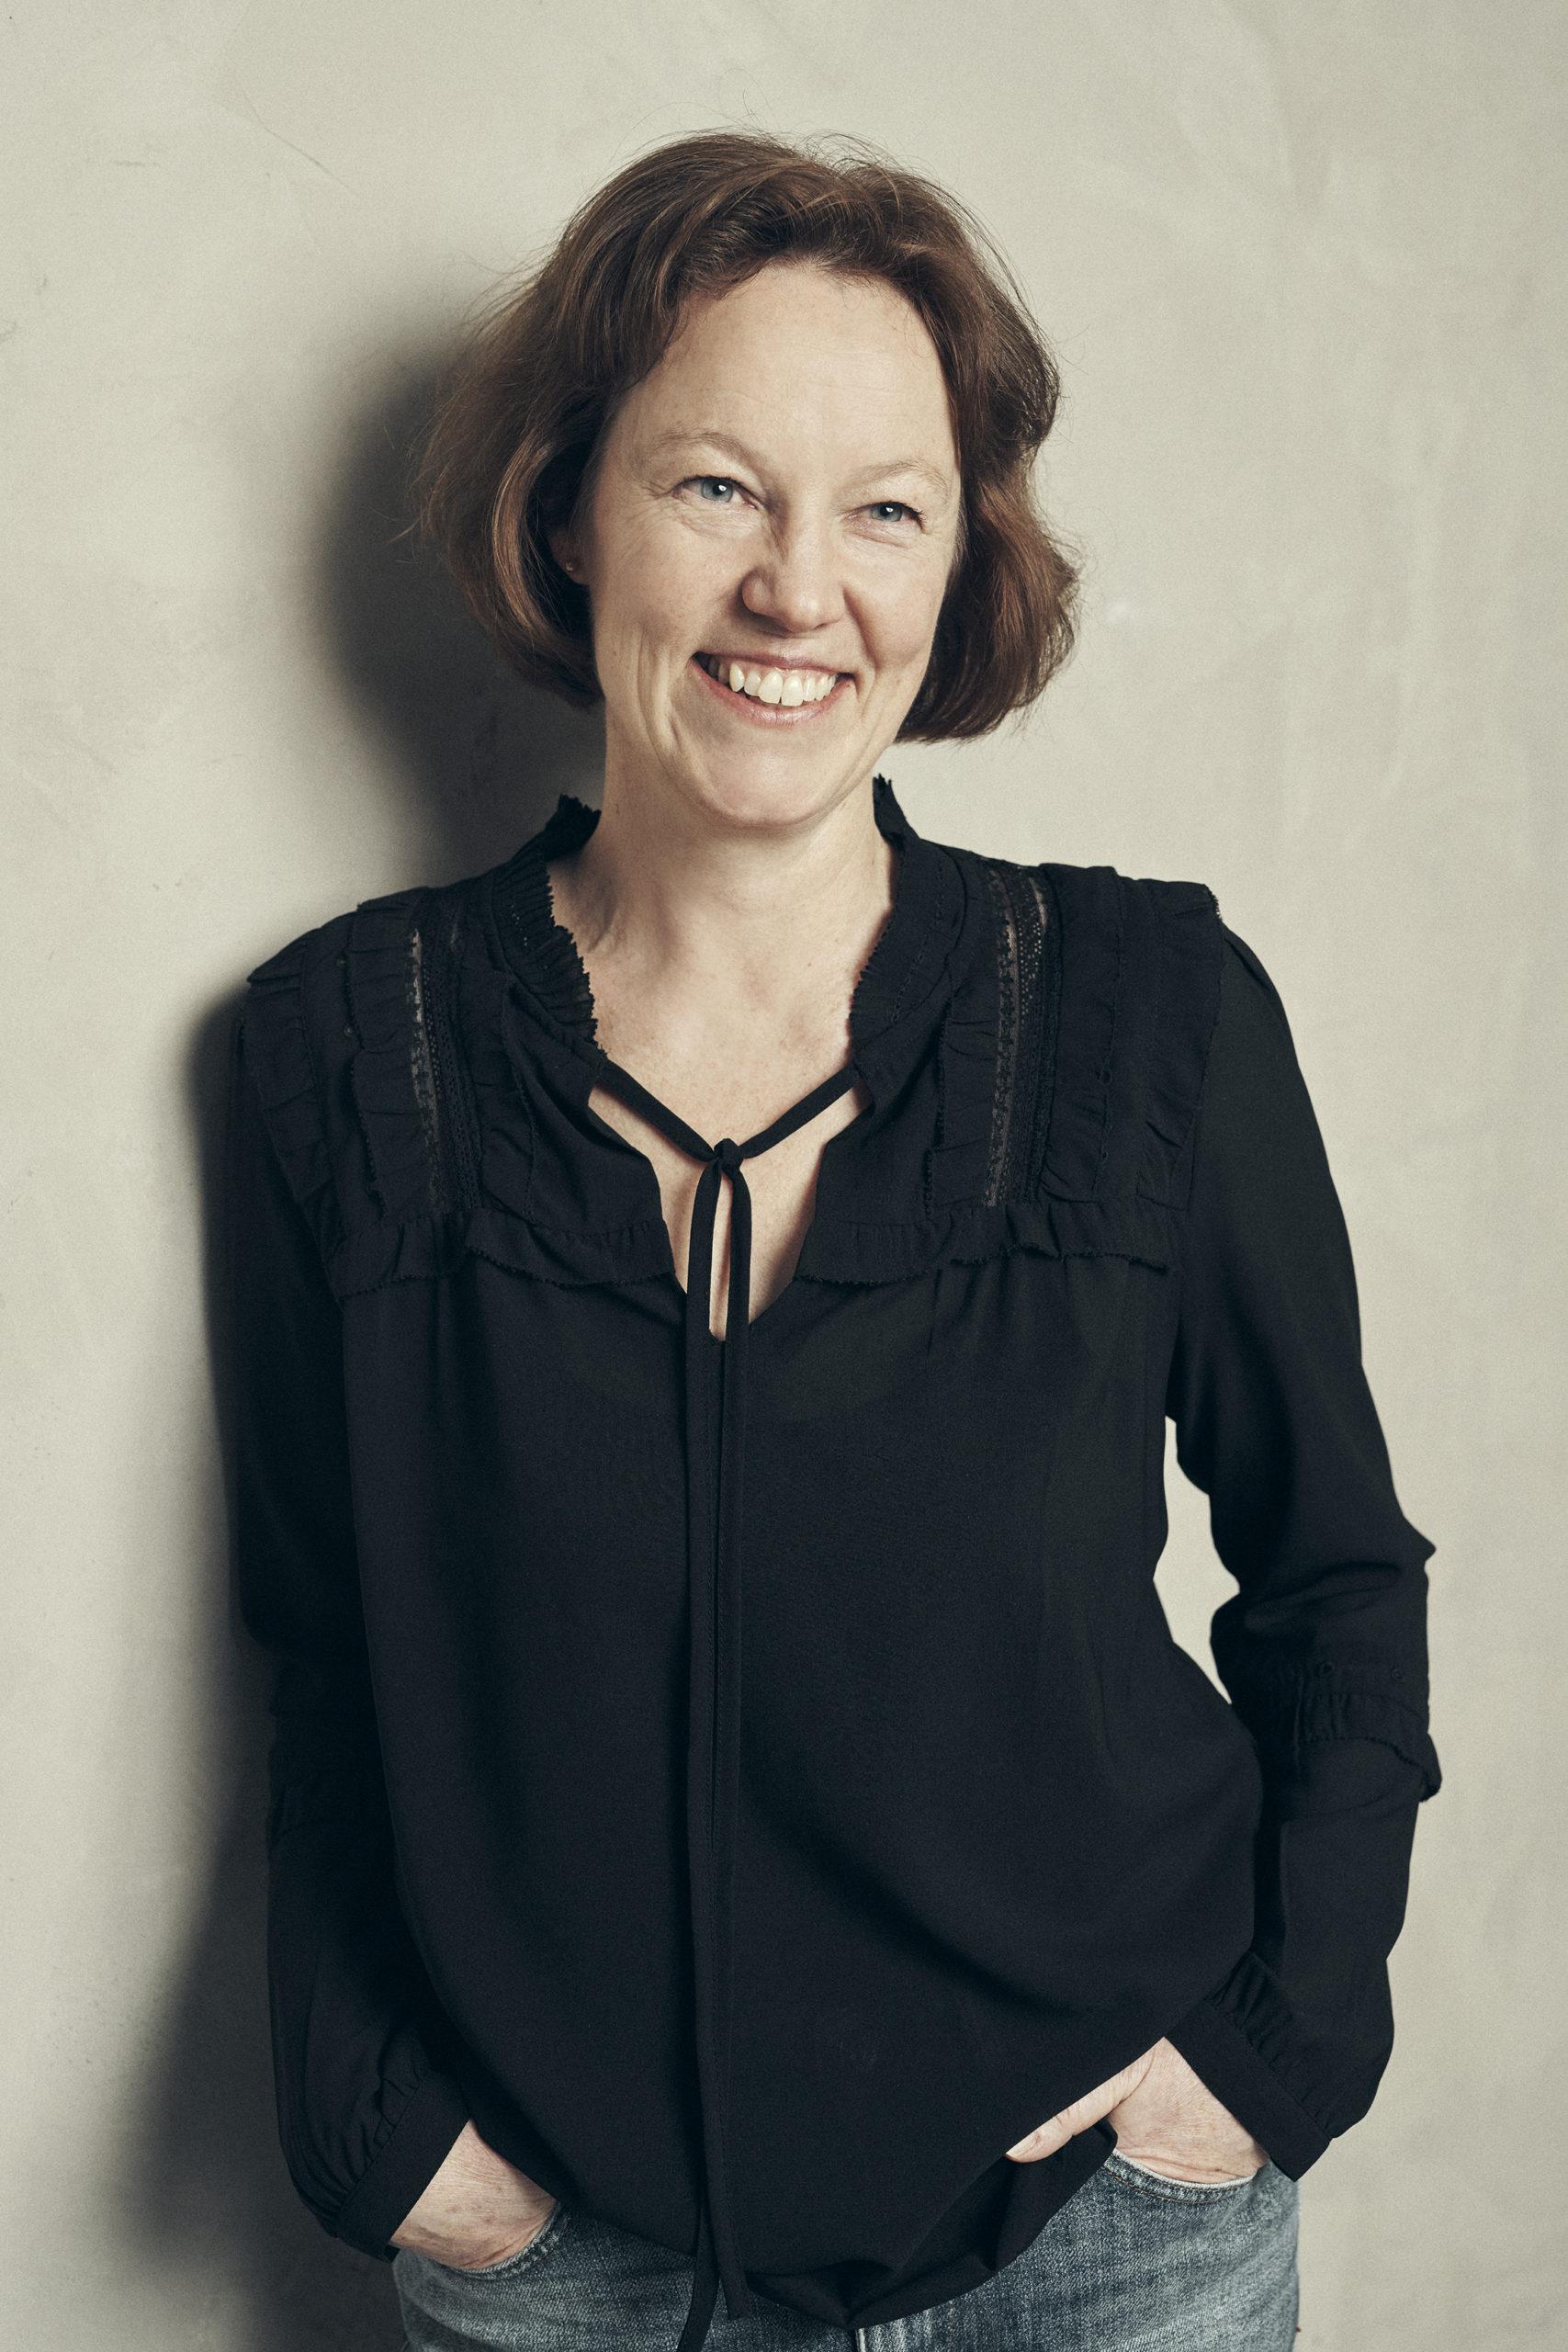 Paula Tiessalo